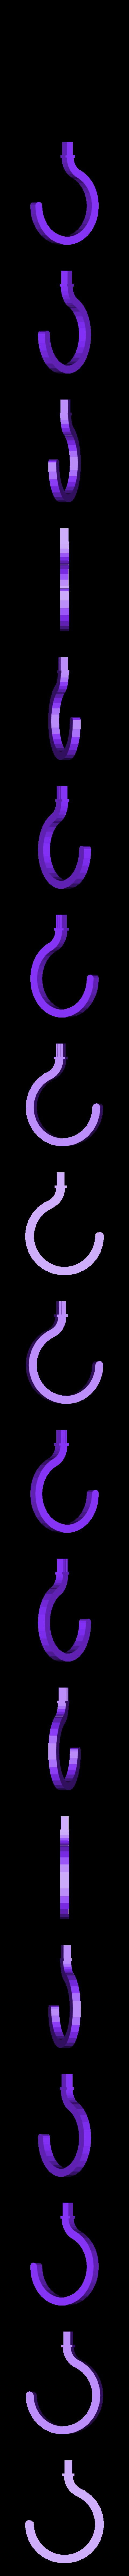 pirate_hand_hook.stl Download free STL file Parametric Pirate Hook • 3D print template, billythemighty3Dprinter